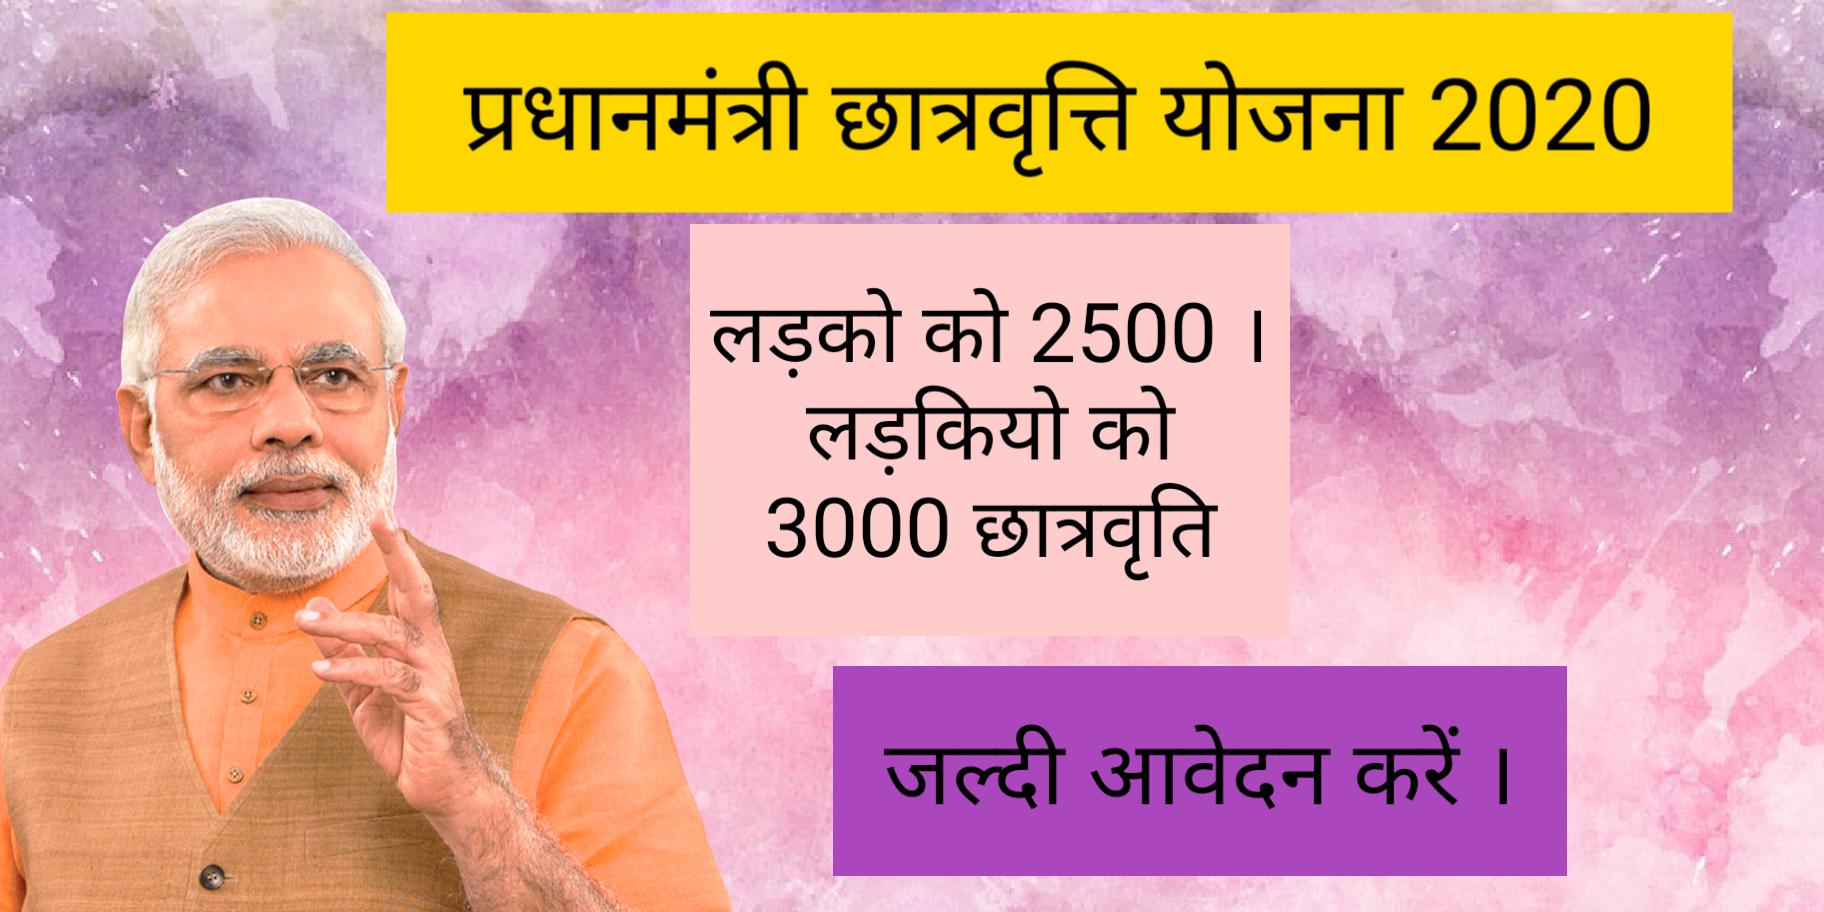 प्रधानमंत्री छात्रवृत्ति योजना 2020 | Pradhanmantri Scholarship Scheme 2020 |